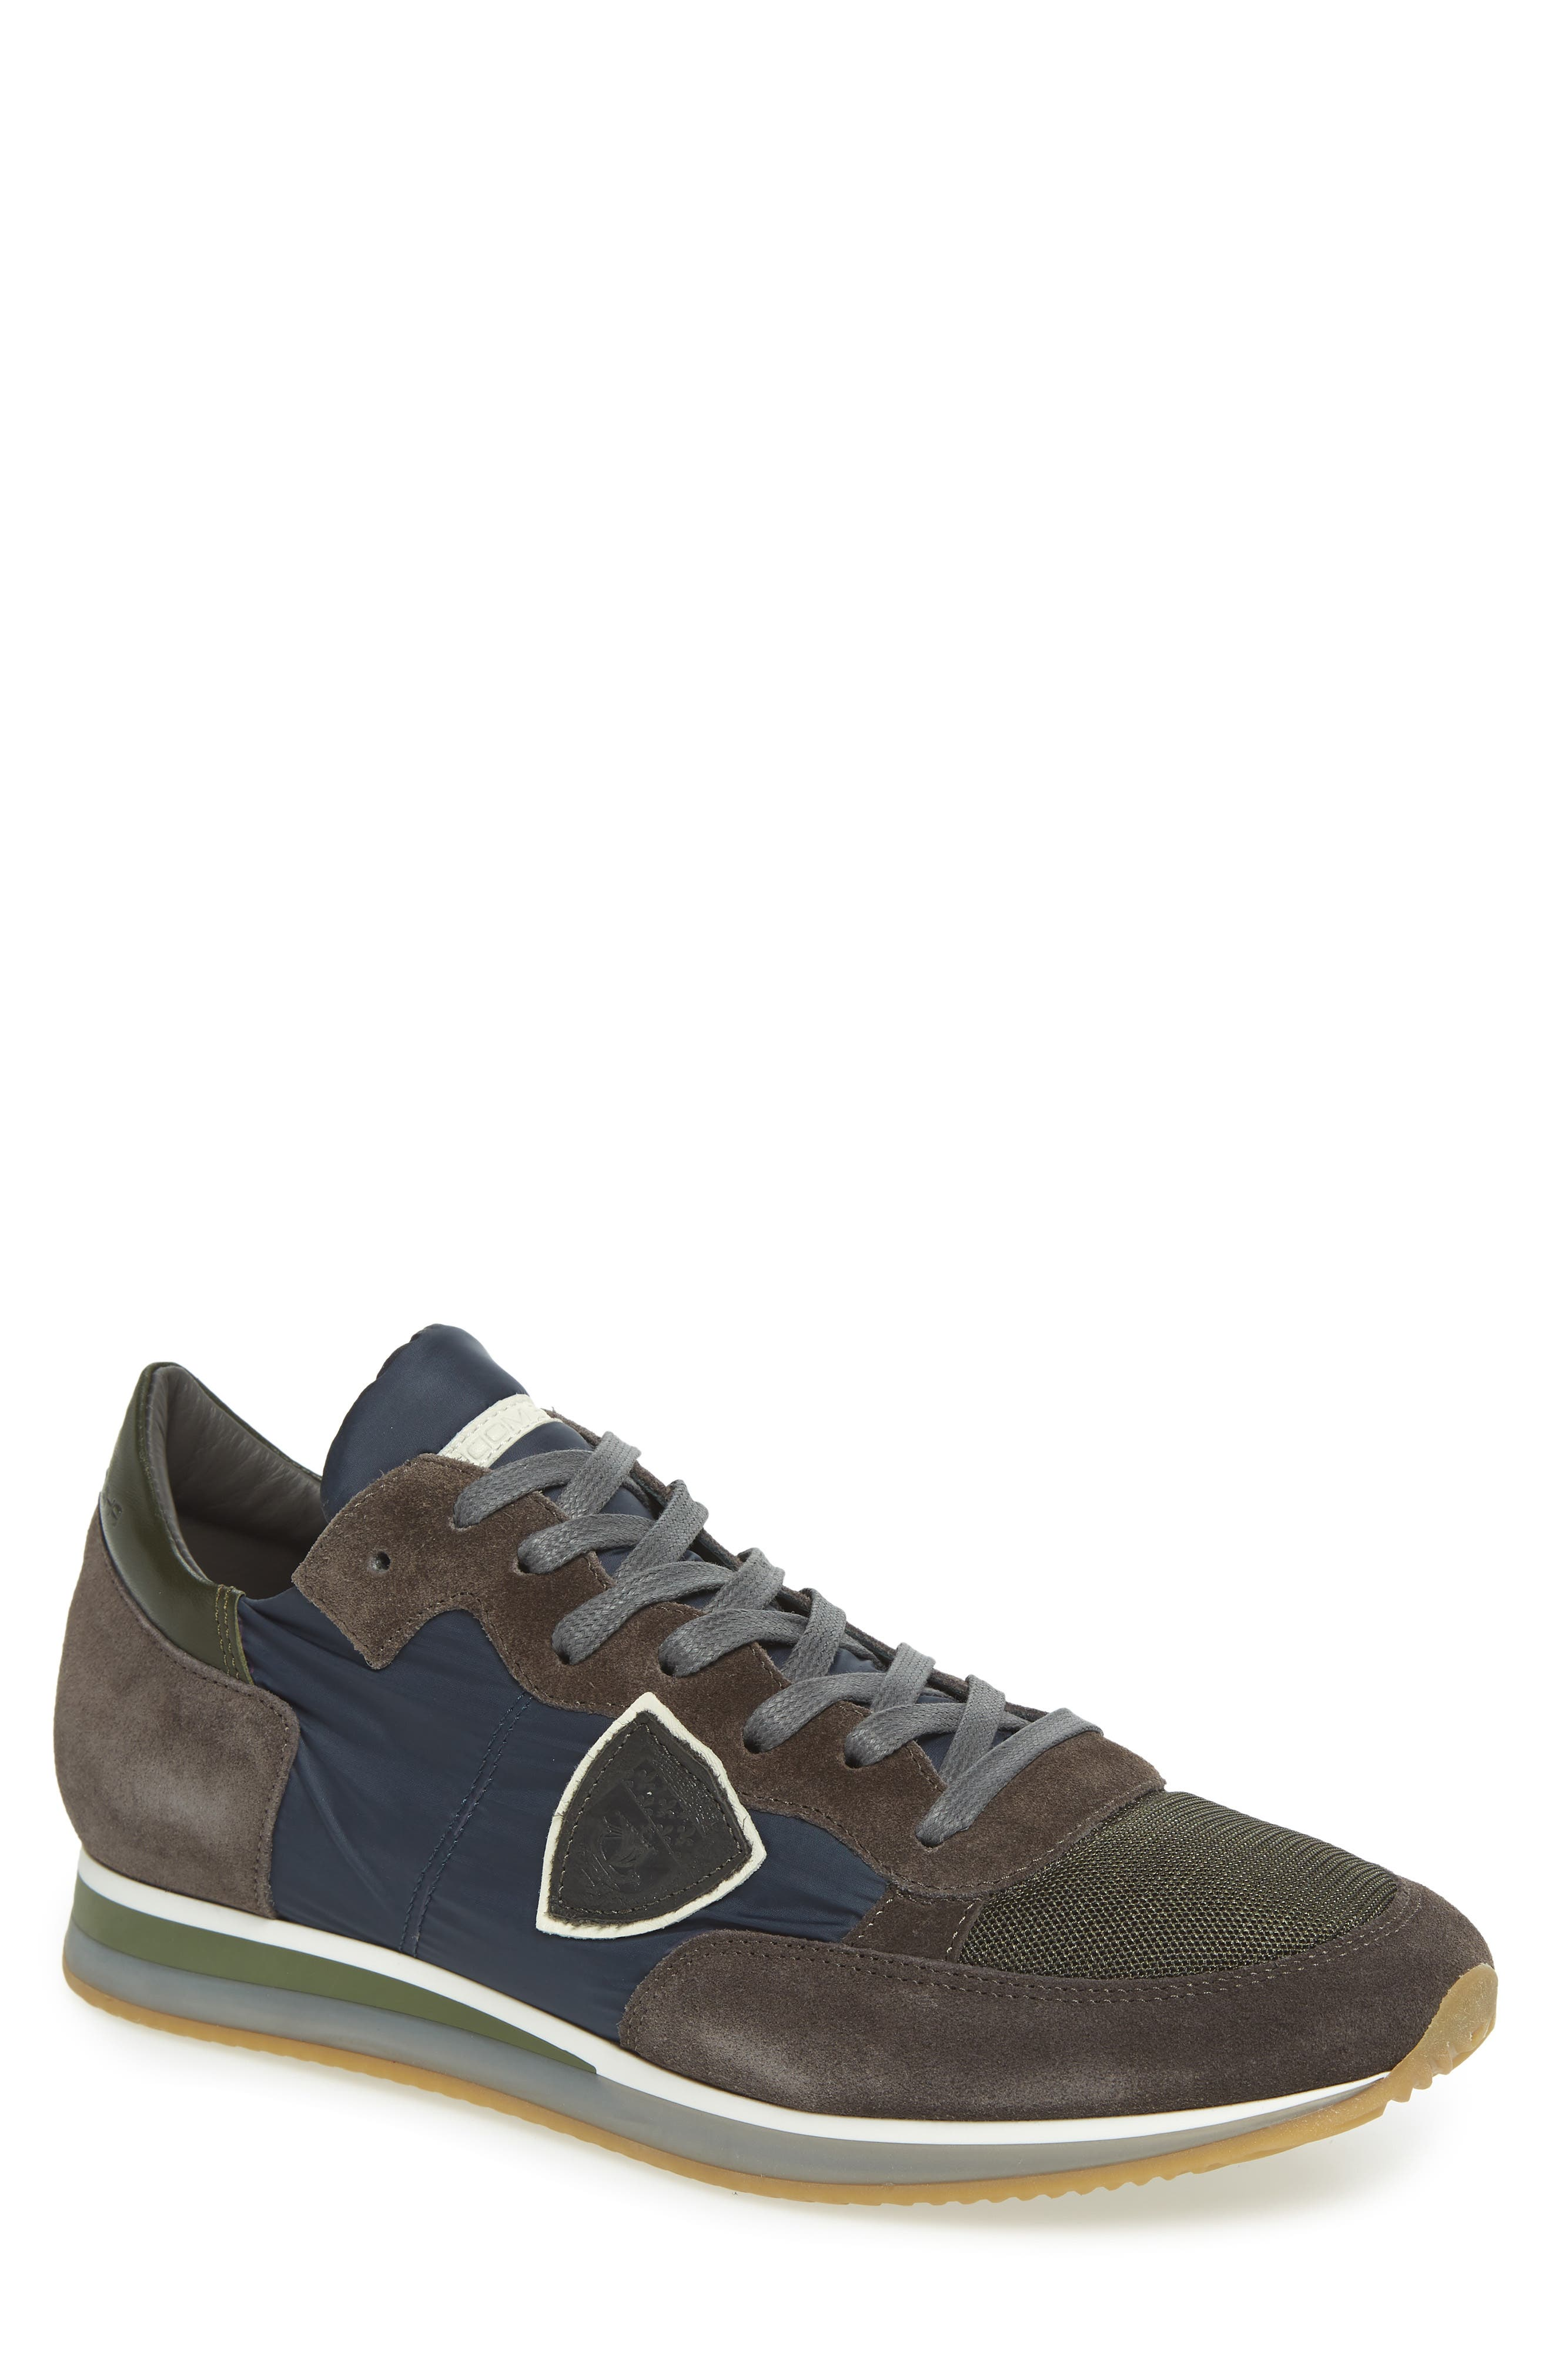 Tropez Low Top Sneaker,                         Main,                         color, BLUE/ GREY